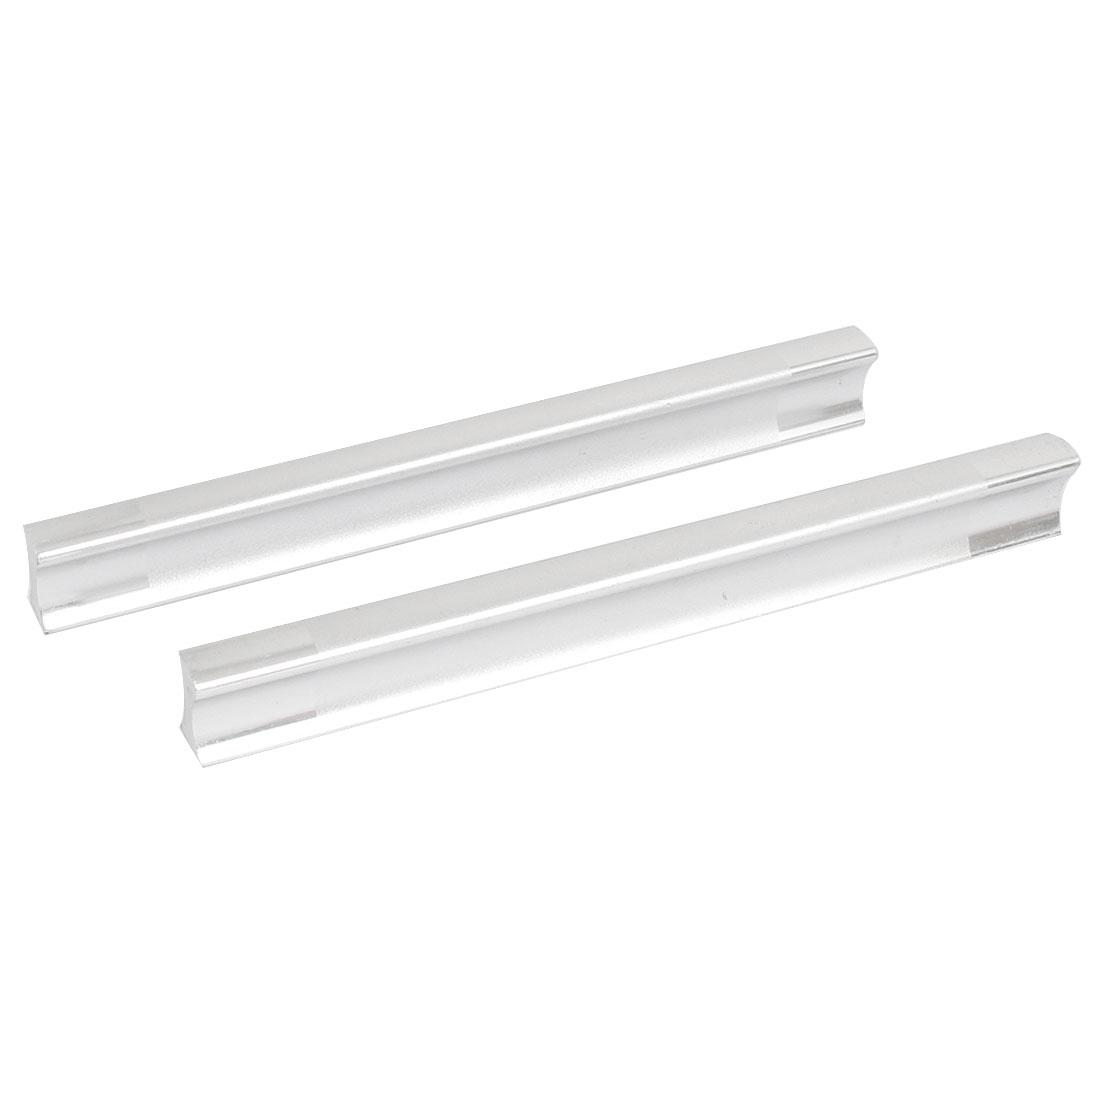 "2pcs Kitchen Drawer Cabinet Cupboard Door Bar Pull Handle Knob 8"" Length"